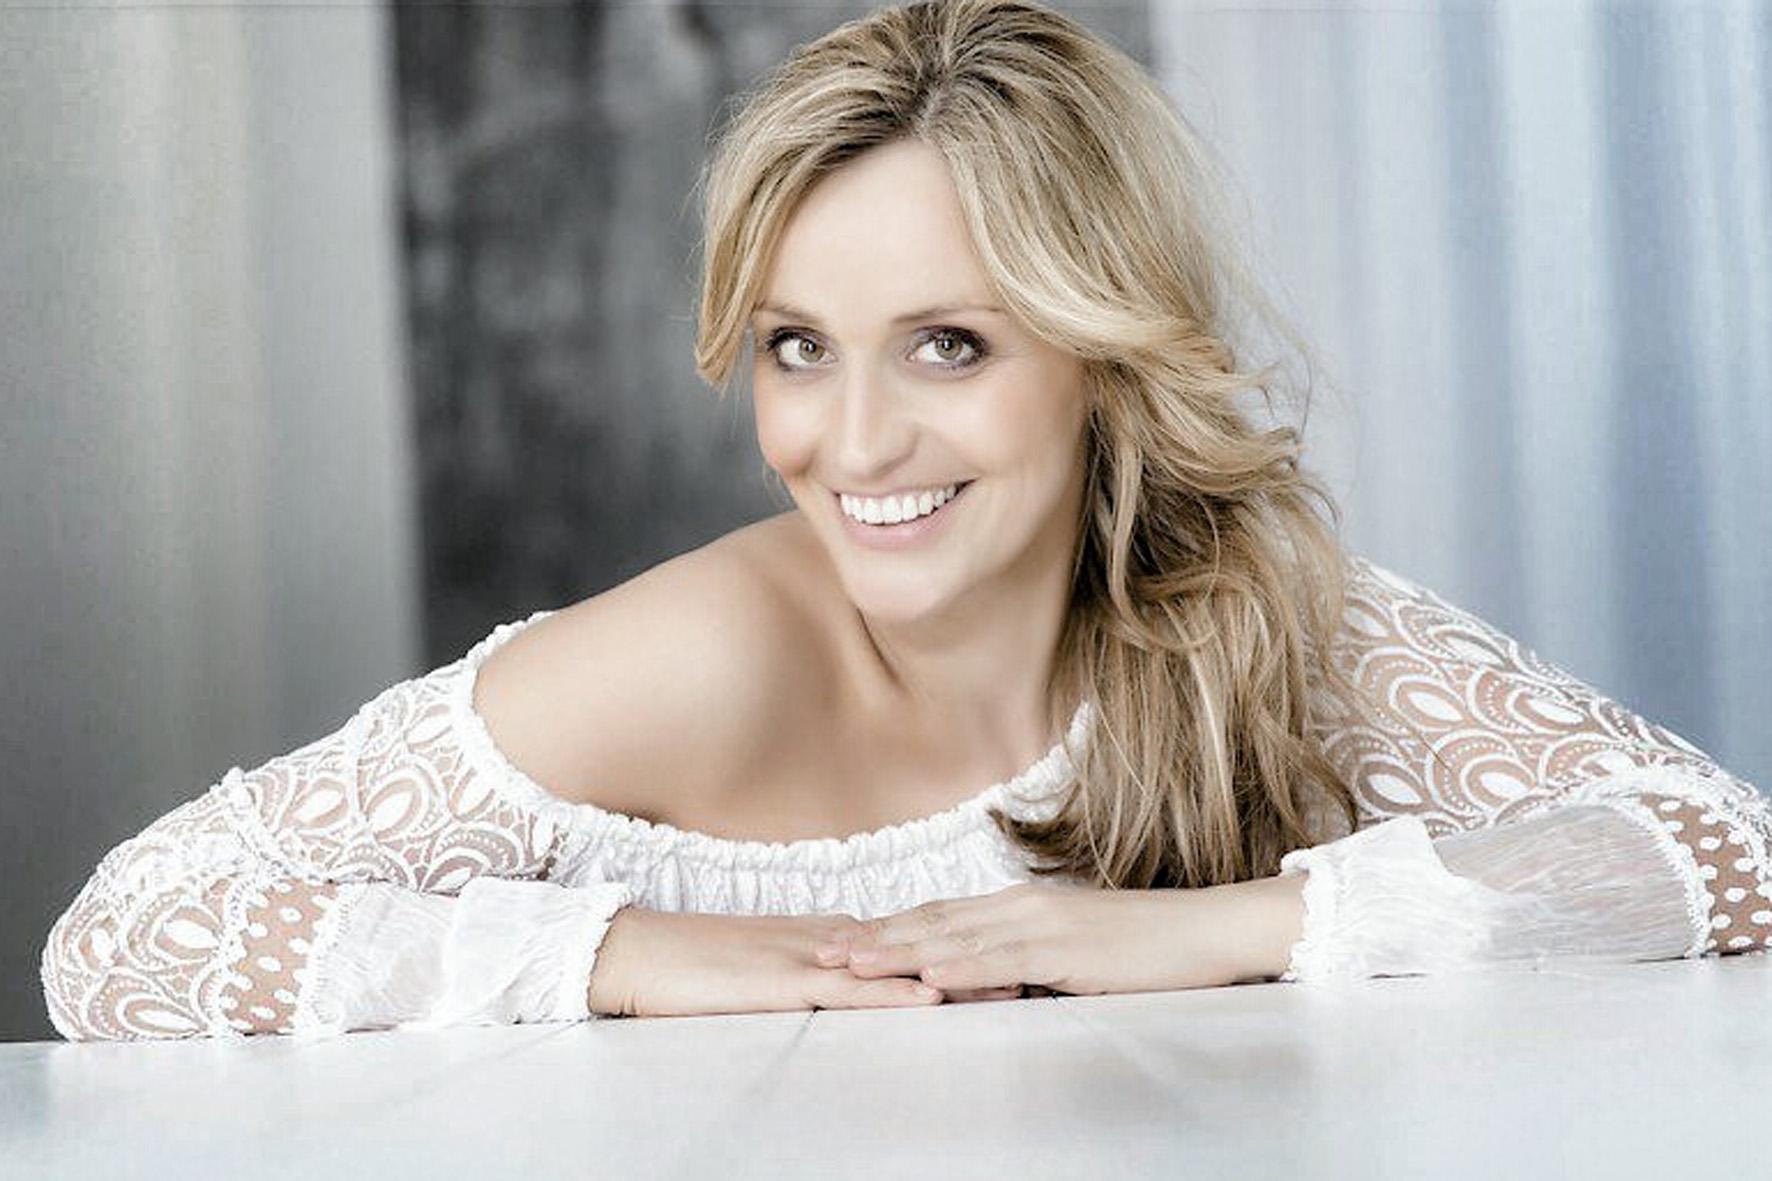 dr sandra maria gronewald - Kay Solve Richter Lebenslauf